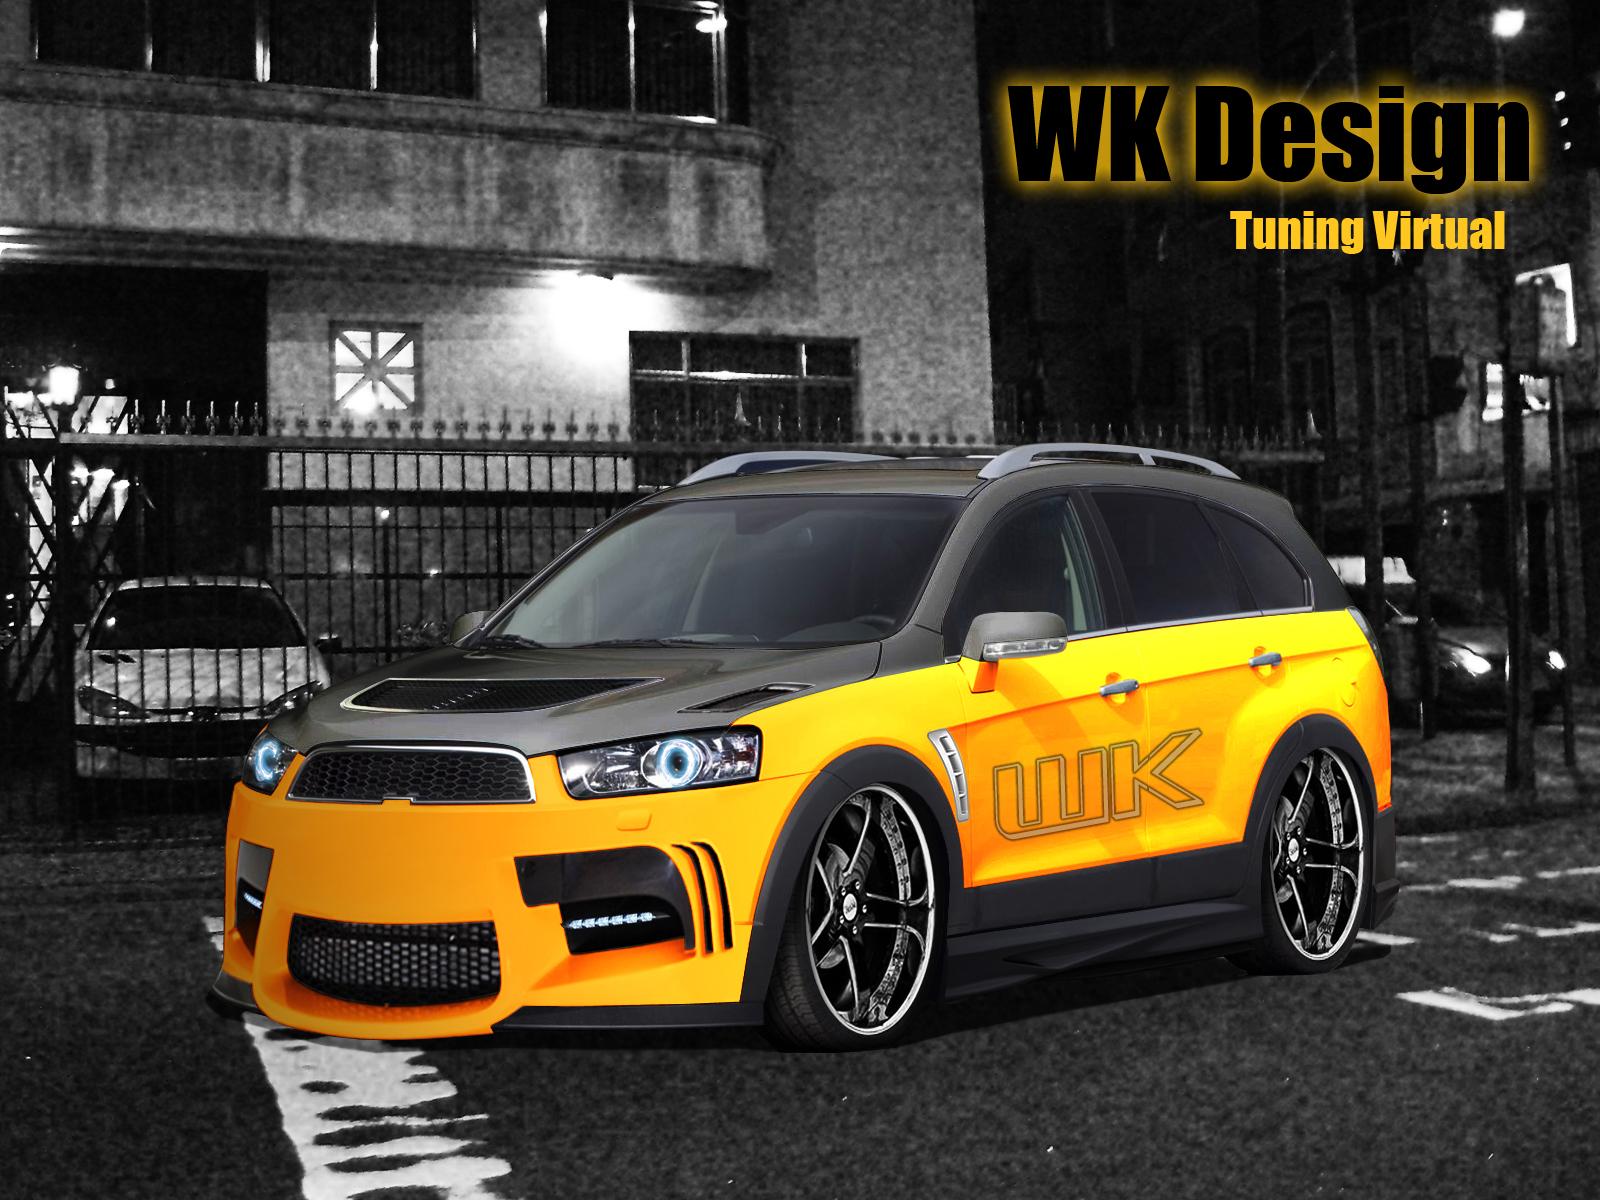 Carros Tuning Lindos Rapidos Turbinados